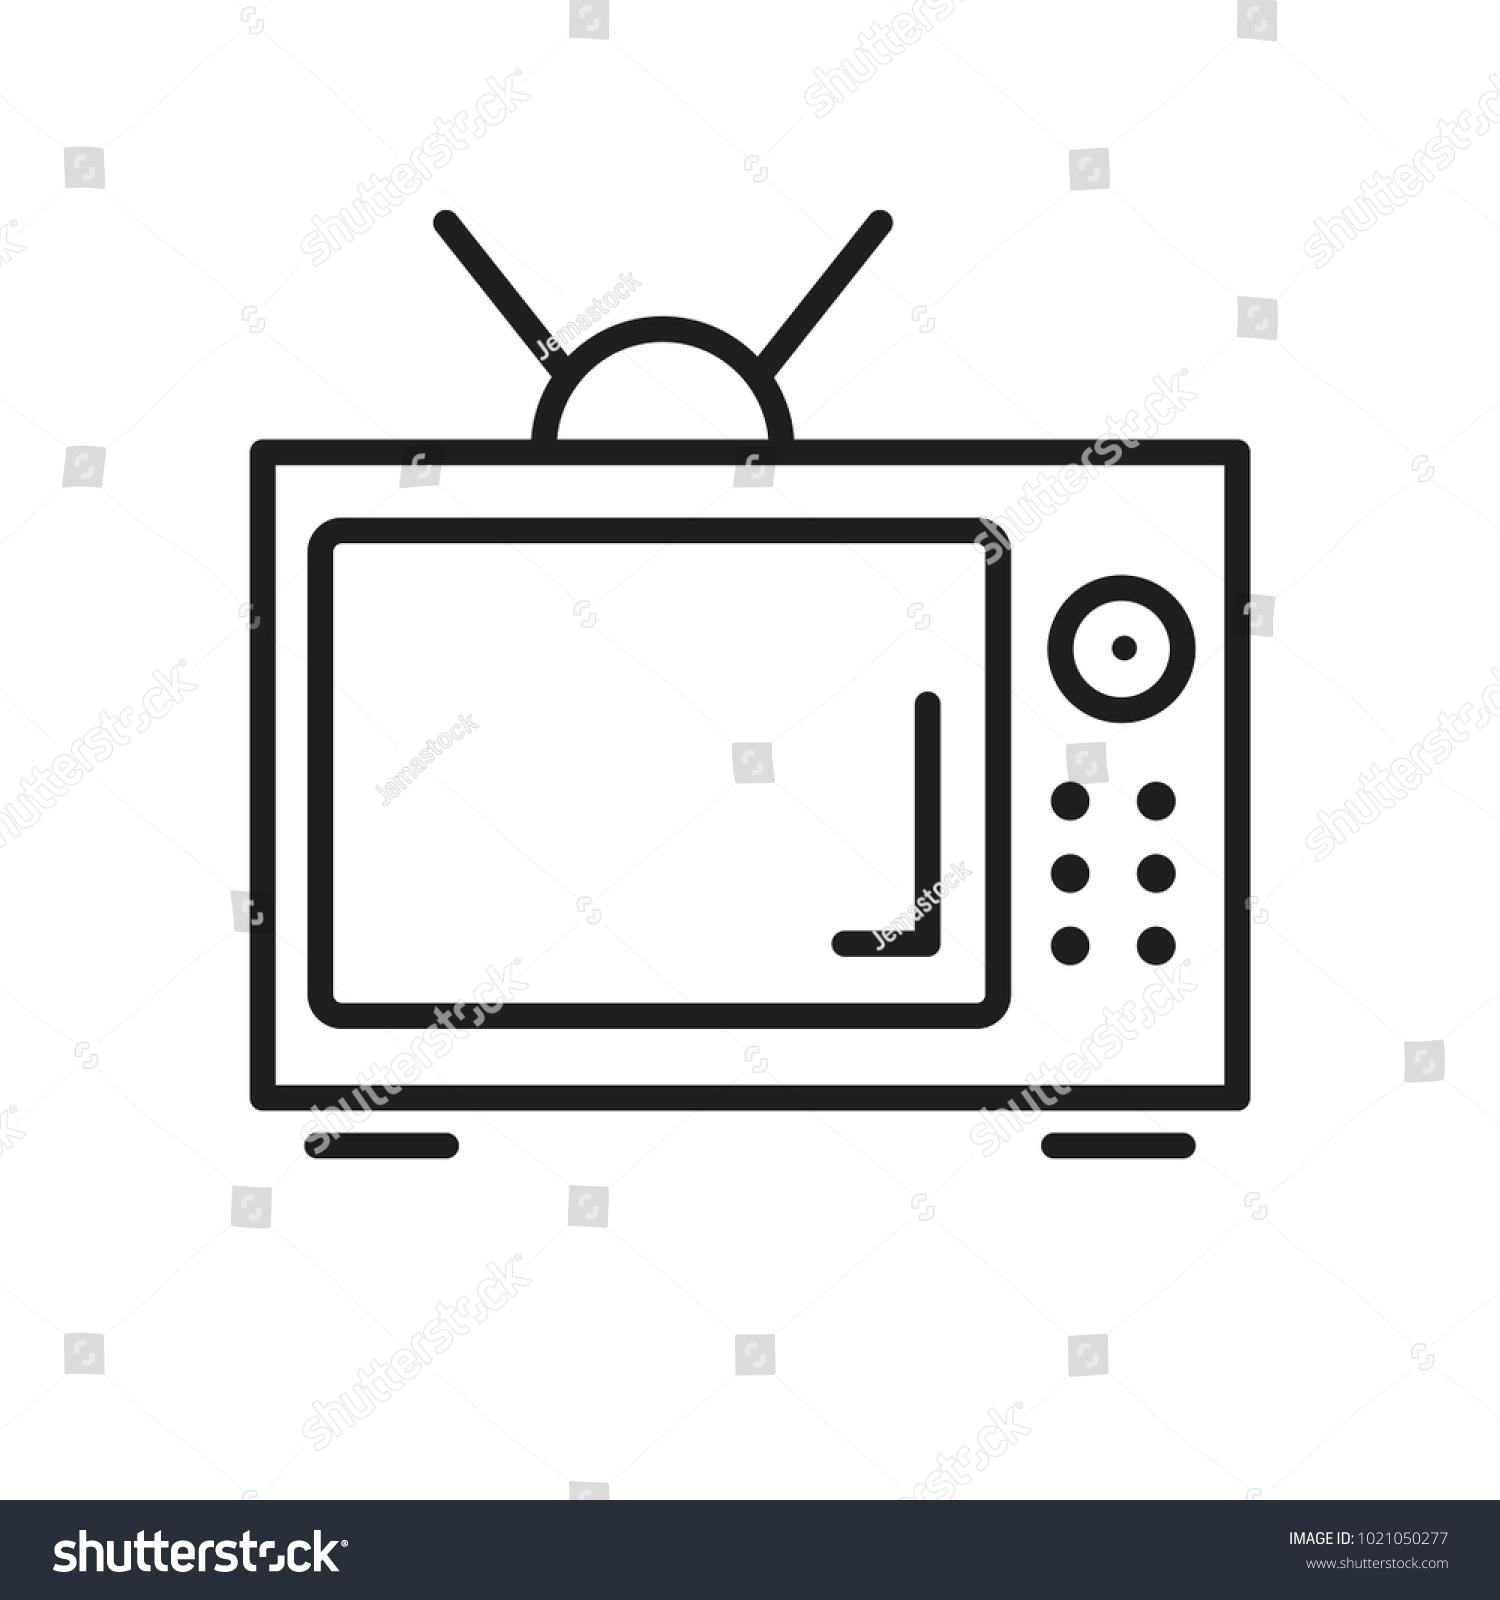 29   Best Tv Antenna for Tv Antenna Symbol  565ane